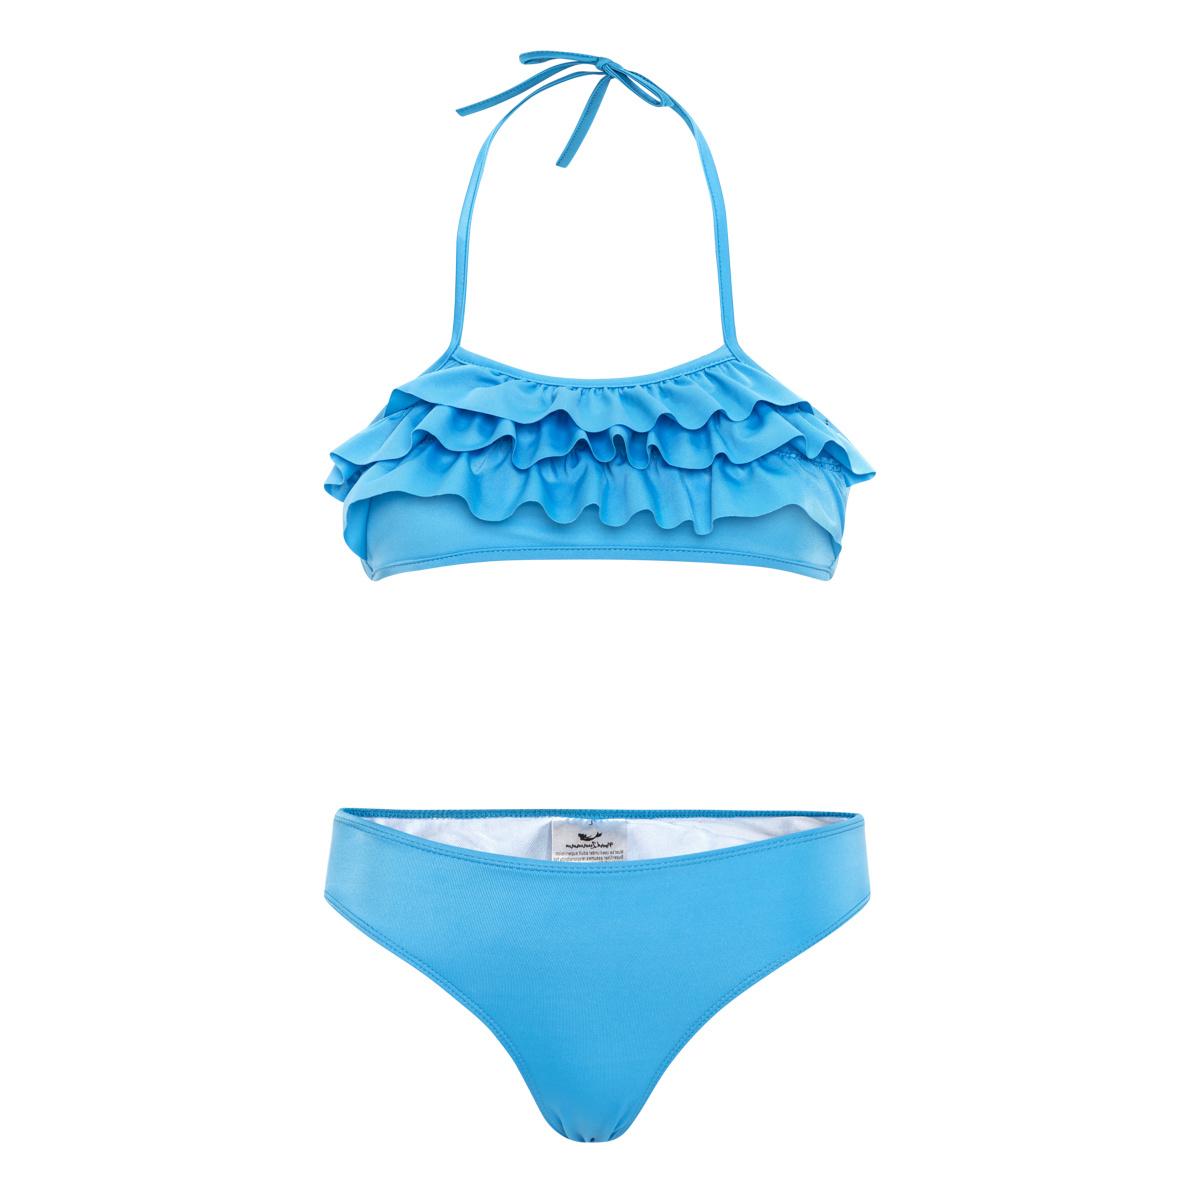 NoordZeemeermin Complete set with Mermaid tail, Monovin and Bikini